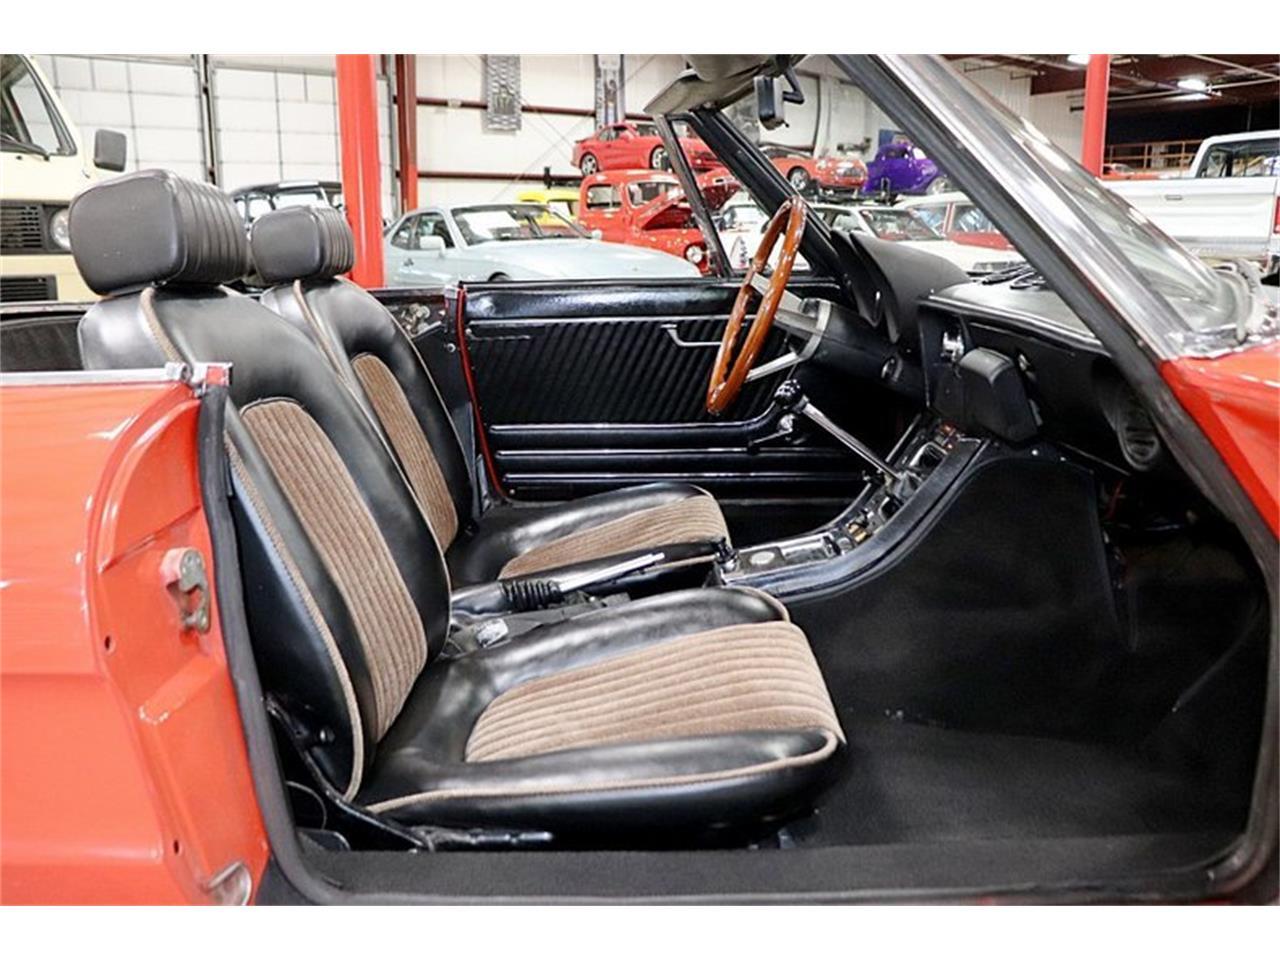 Large Picture of 1974 Alfa Romeo Spider located in Michigan - $14,900.00 - Q6DB